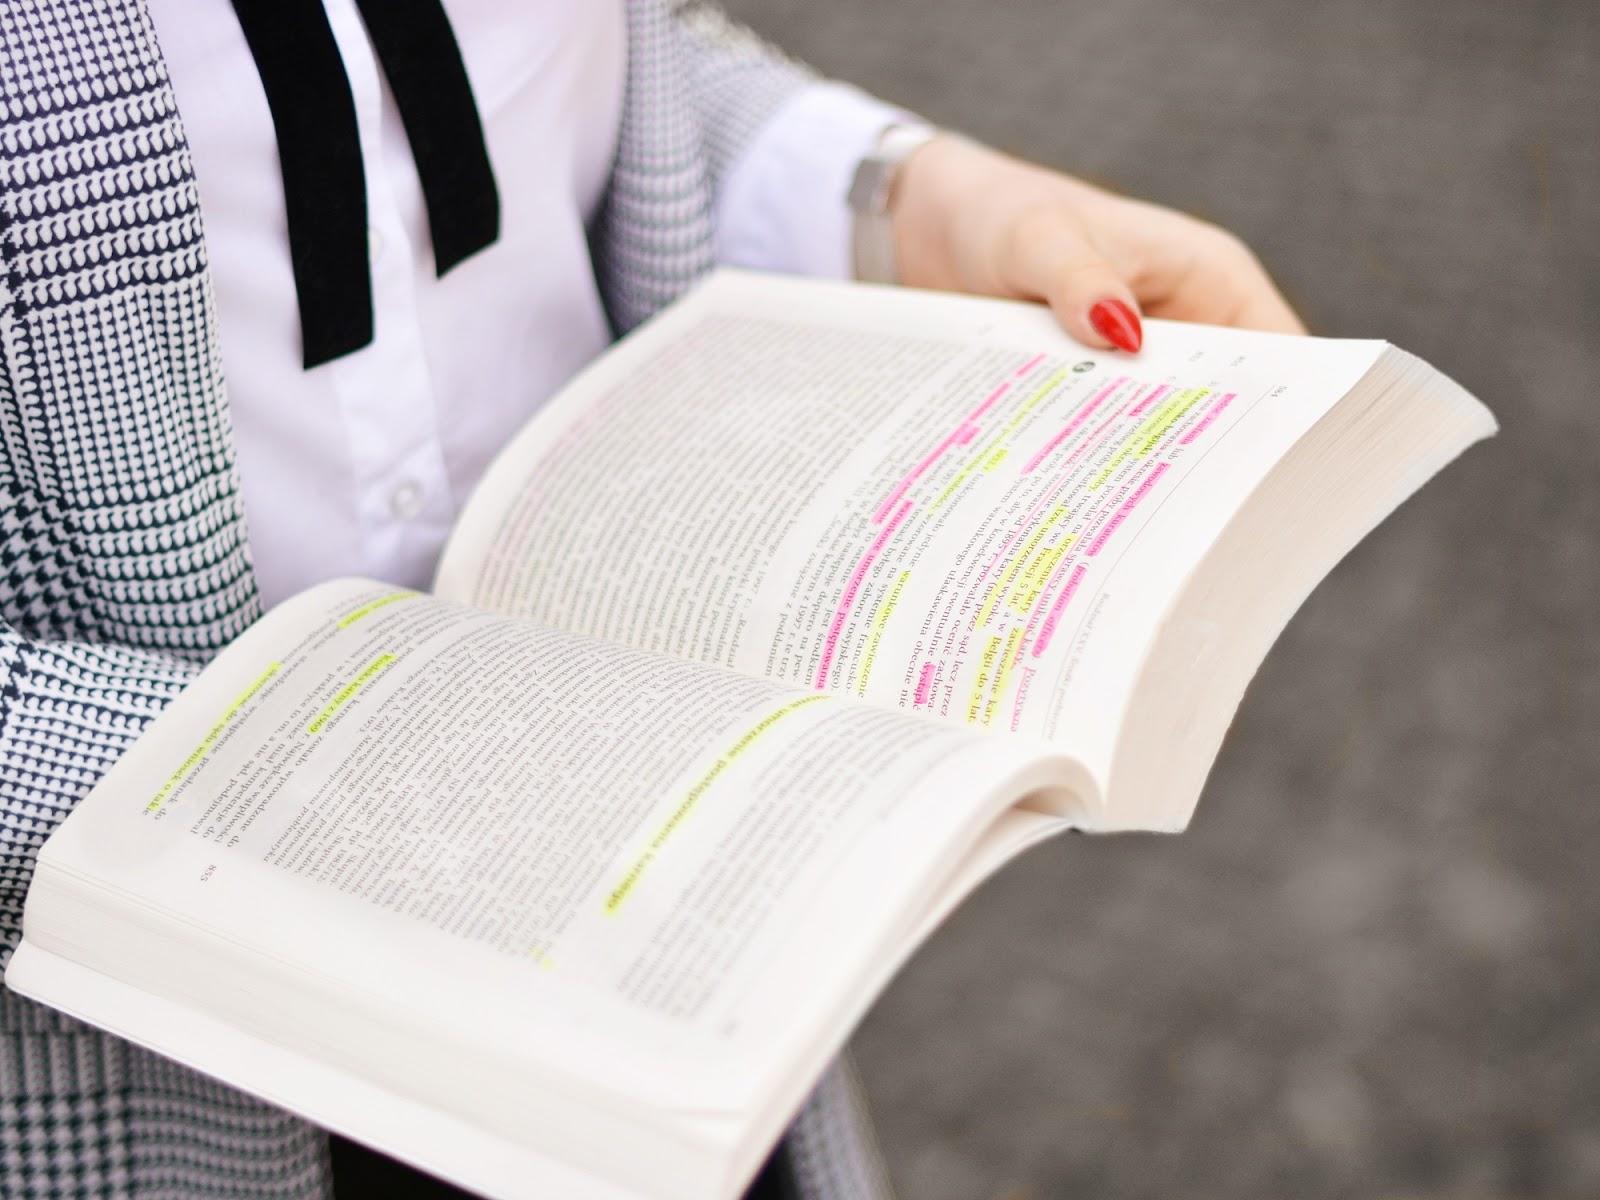 ksiązka studia